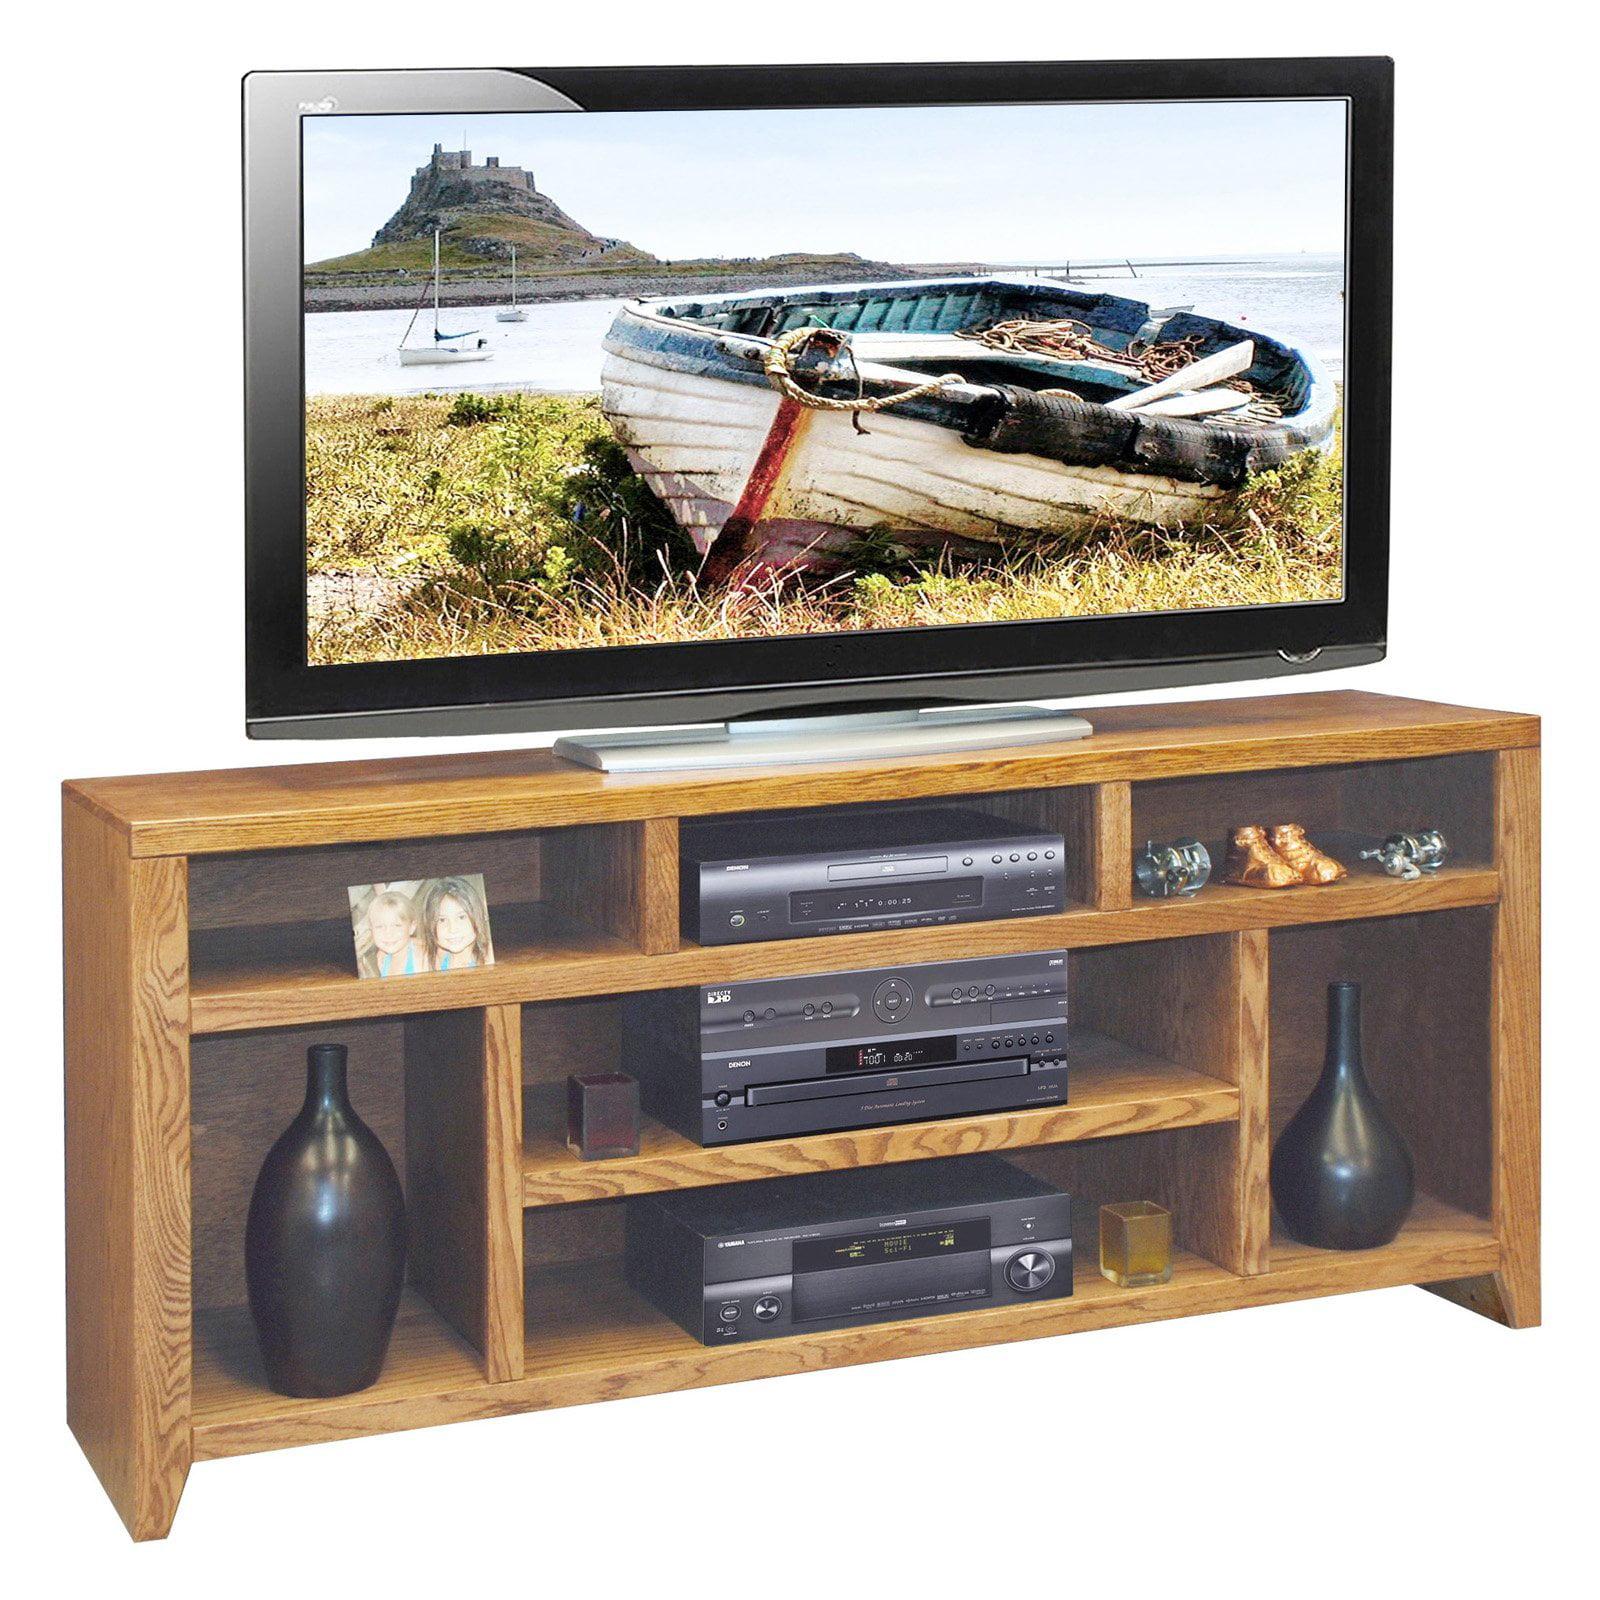 Legends City Loft 66 in. TV Console - Golden Oak